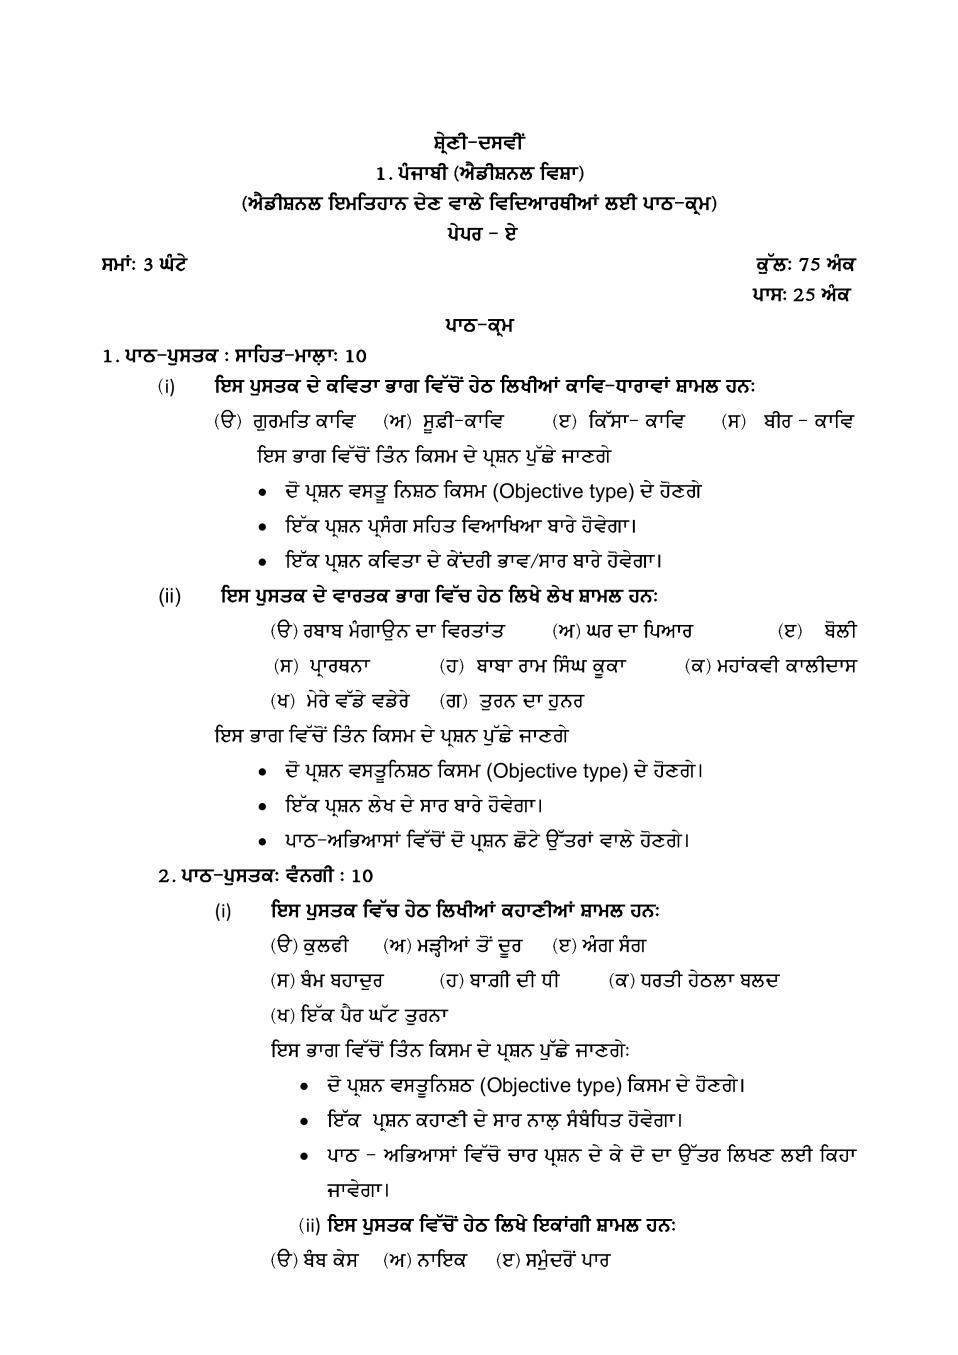 PSEB Syllabus 2020-21 for Class 10 Additional Punjabi - Page 1